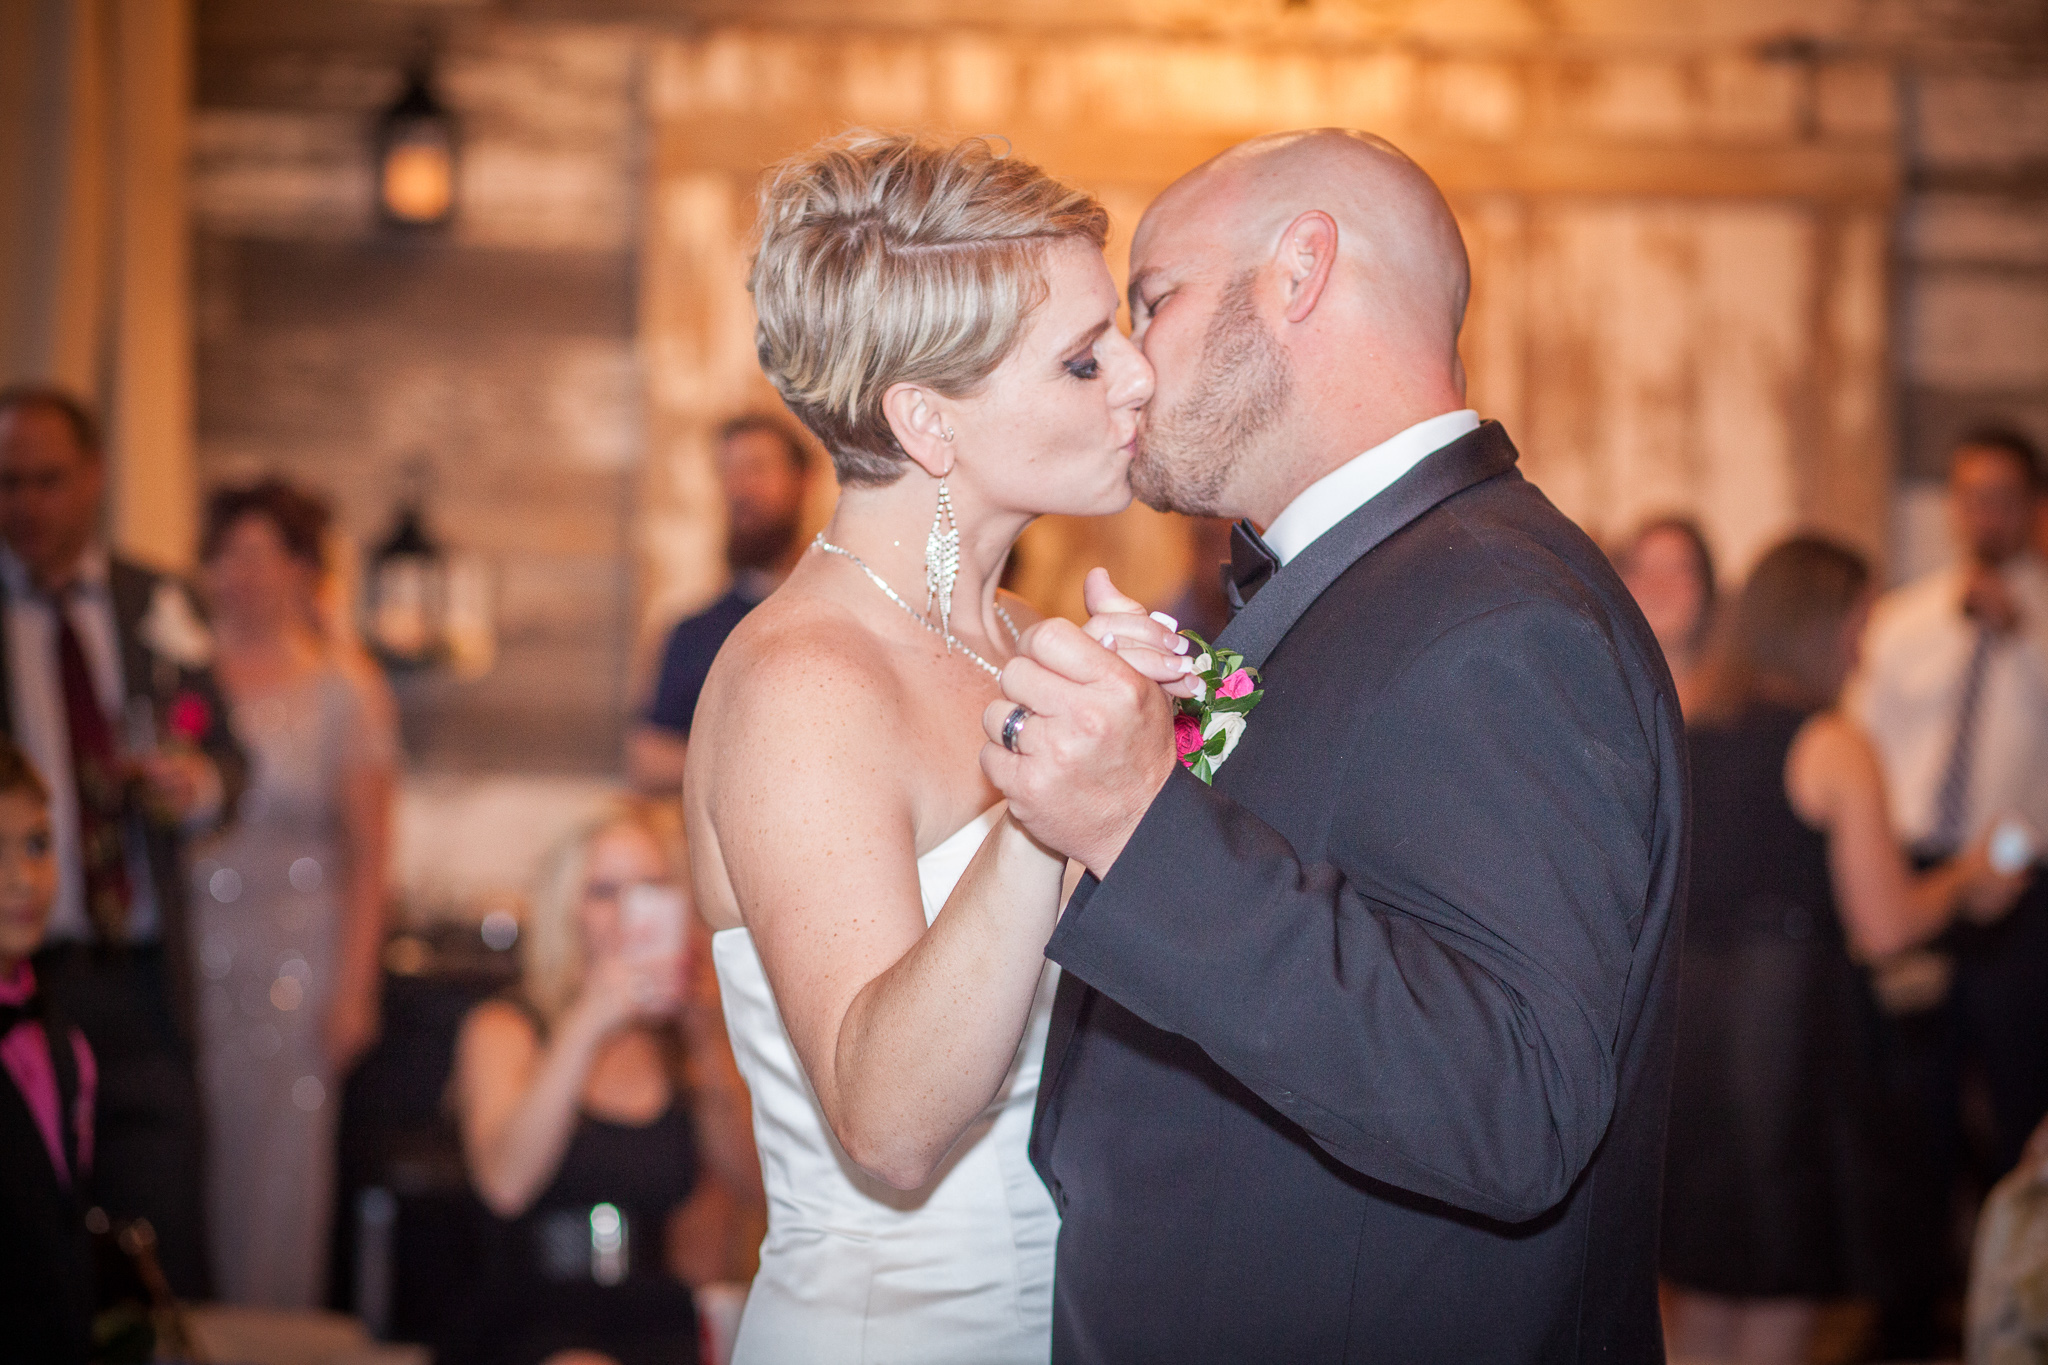 Wedding_Day_Moments_To_Do_List_Melanie&David_289.jpg